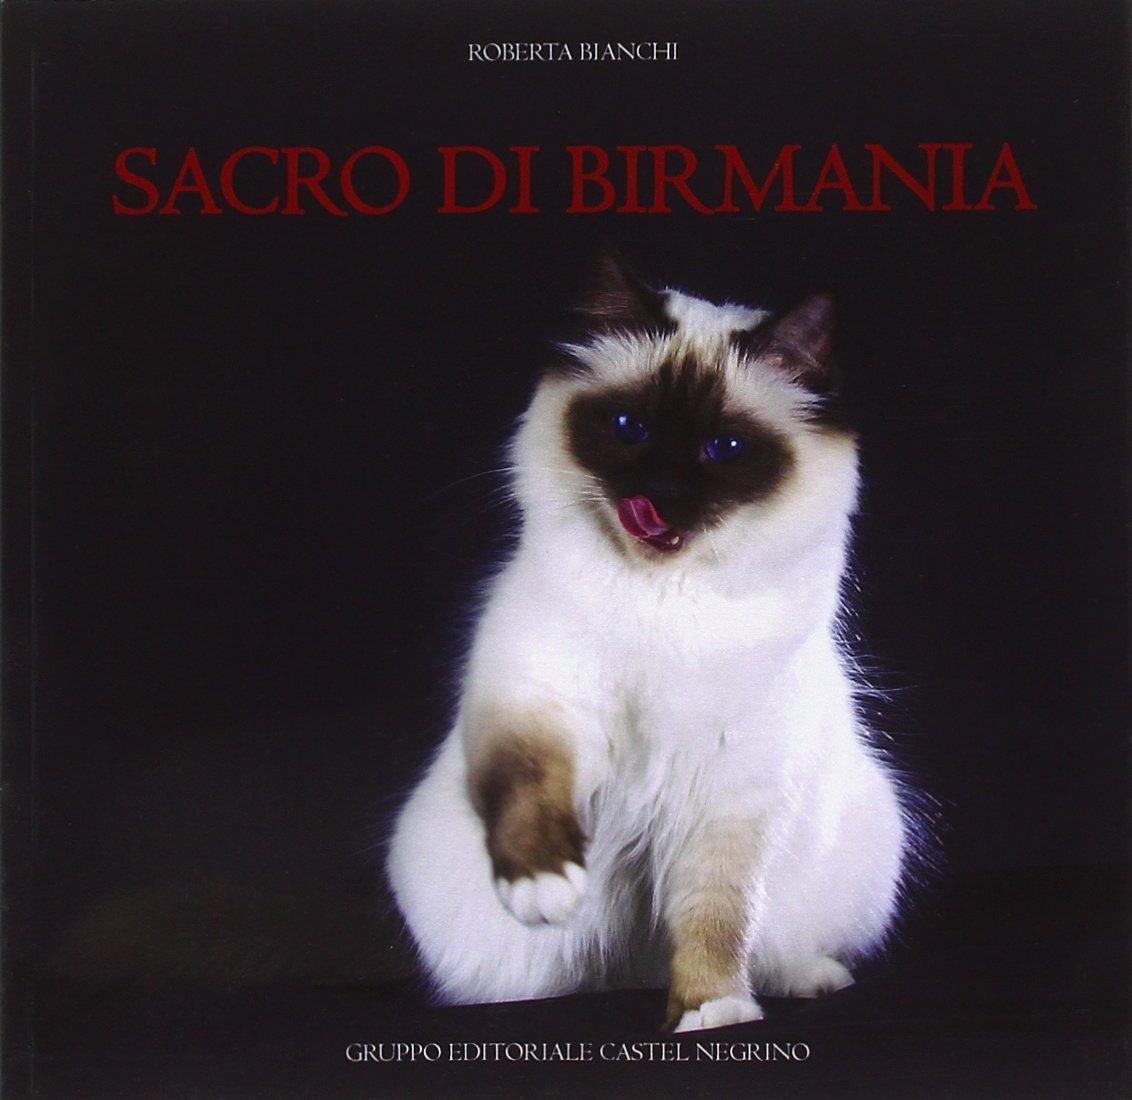 Amazonit Sacro Di Birmania Roberta Bianchi S Caratozzolo Libri